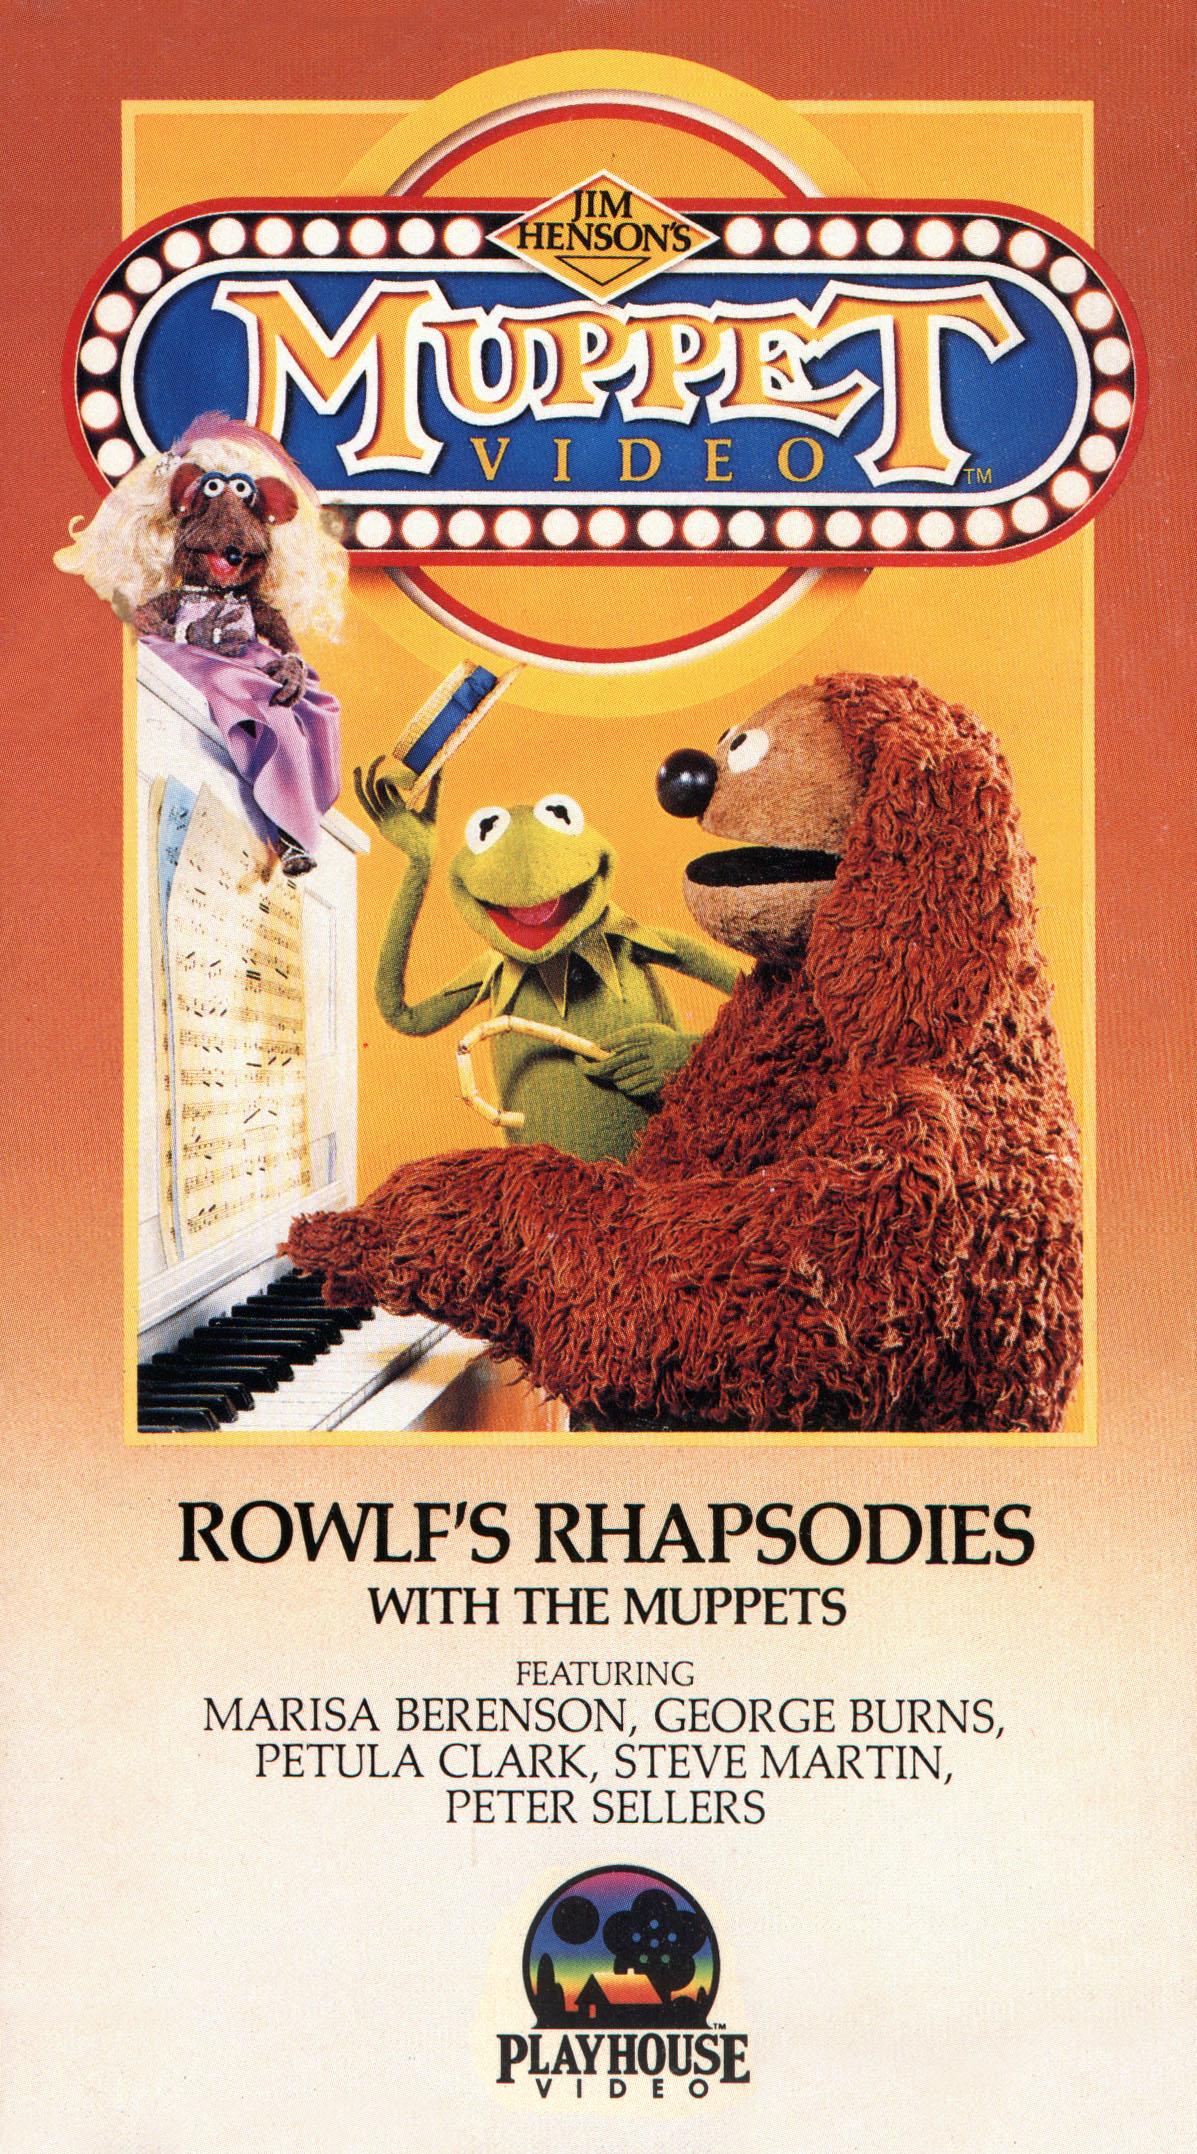 Rowlf's Rhapsodies with the Muppets | Muppet Wiki | FANDOM